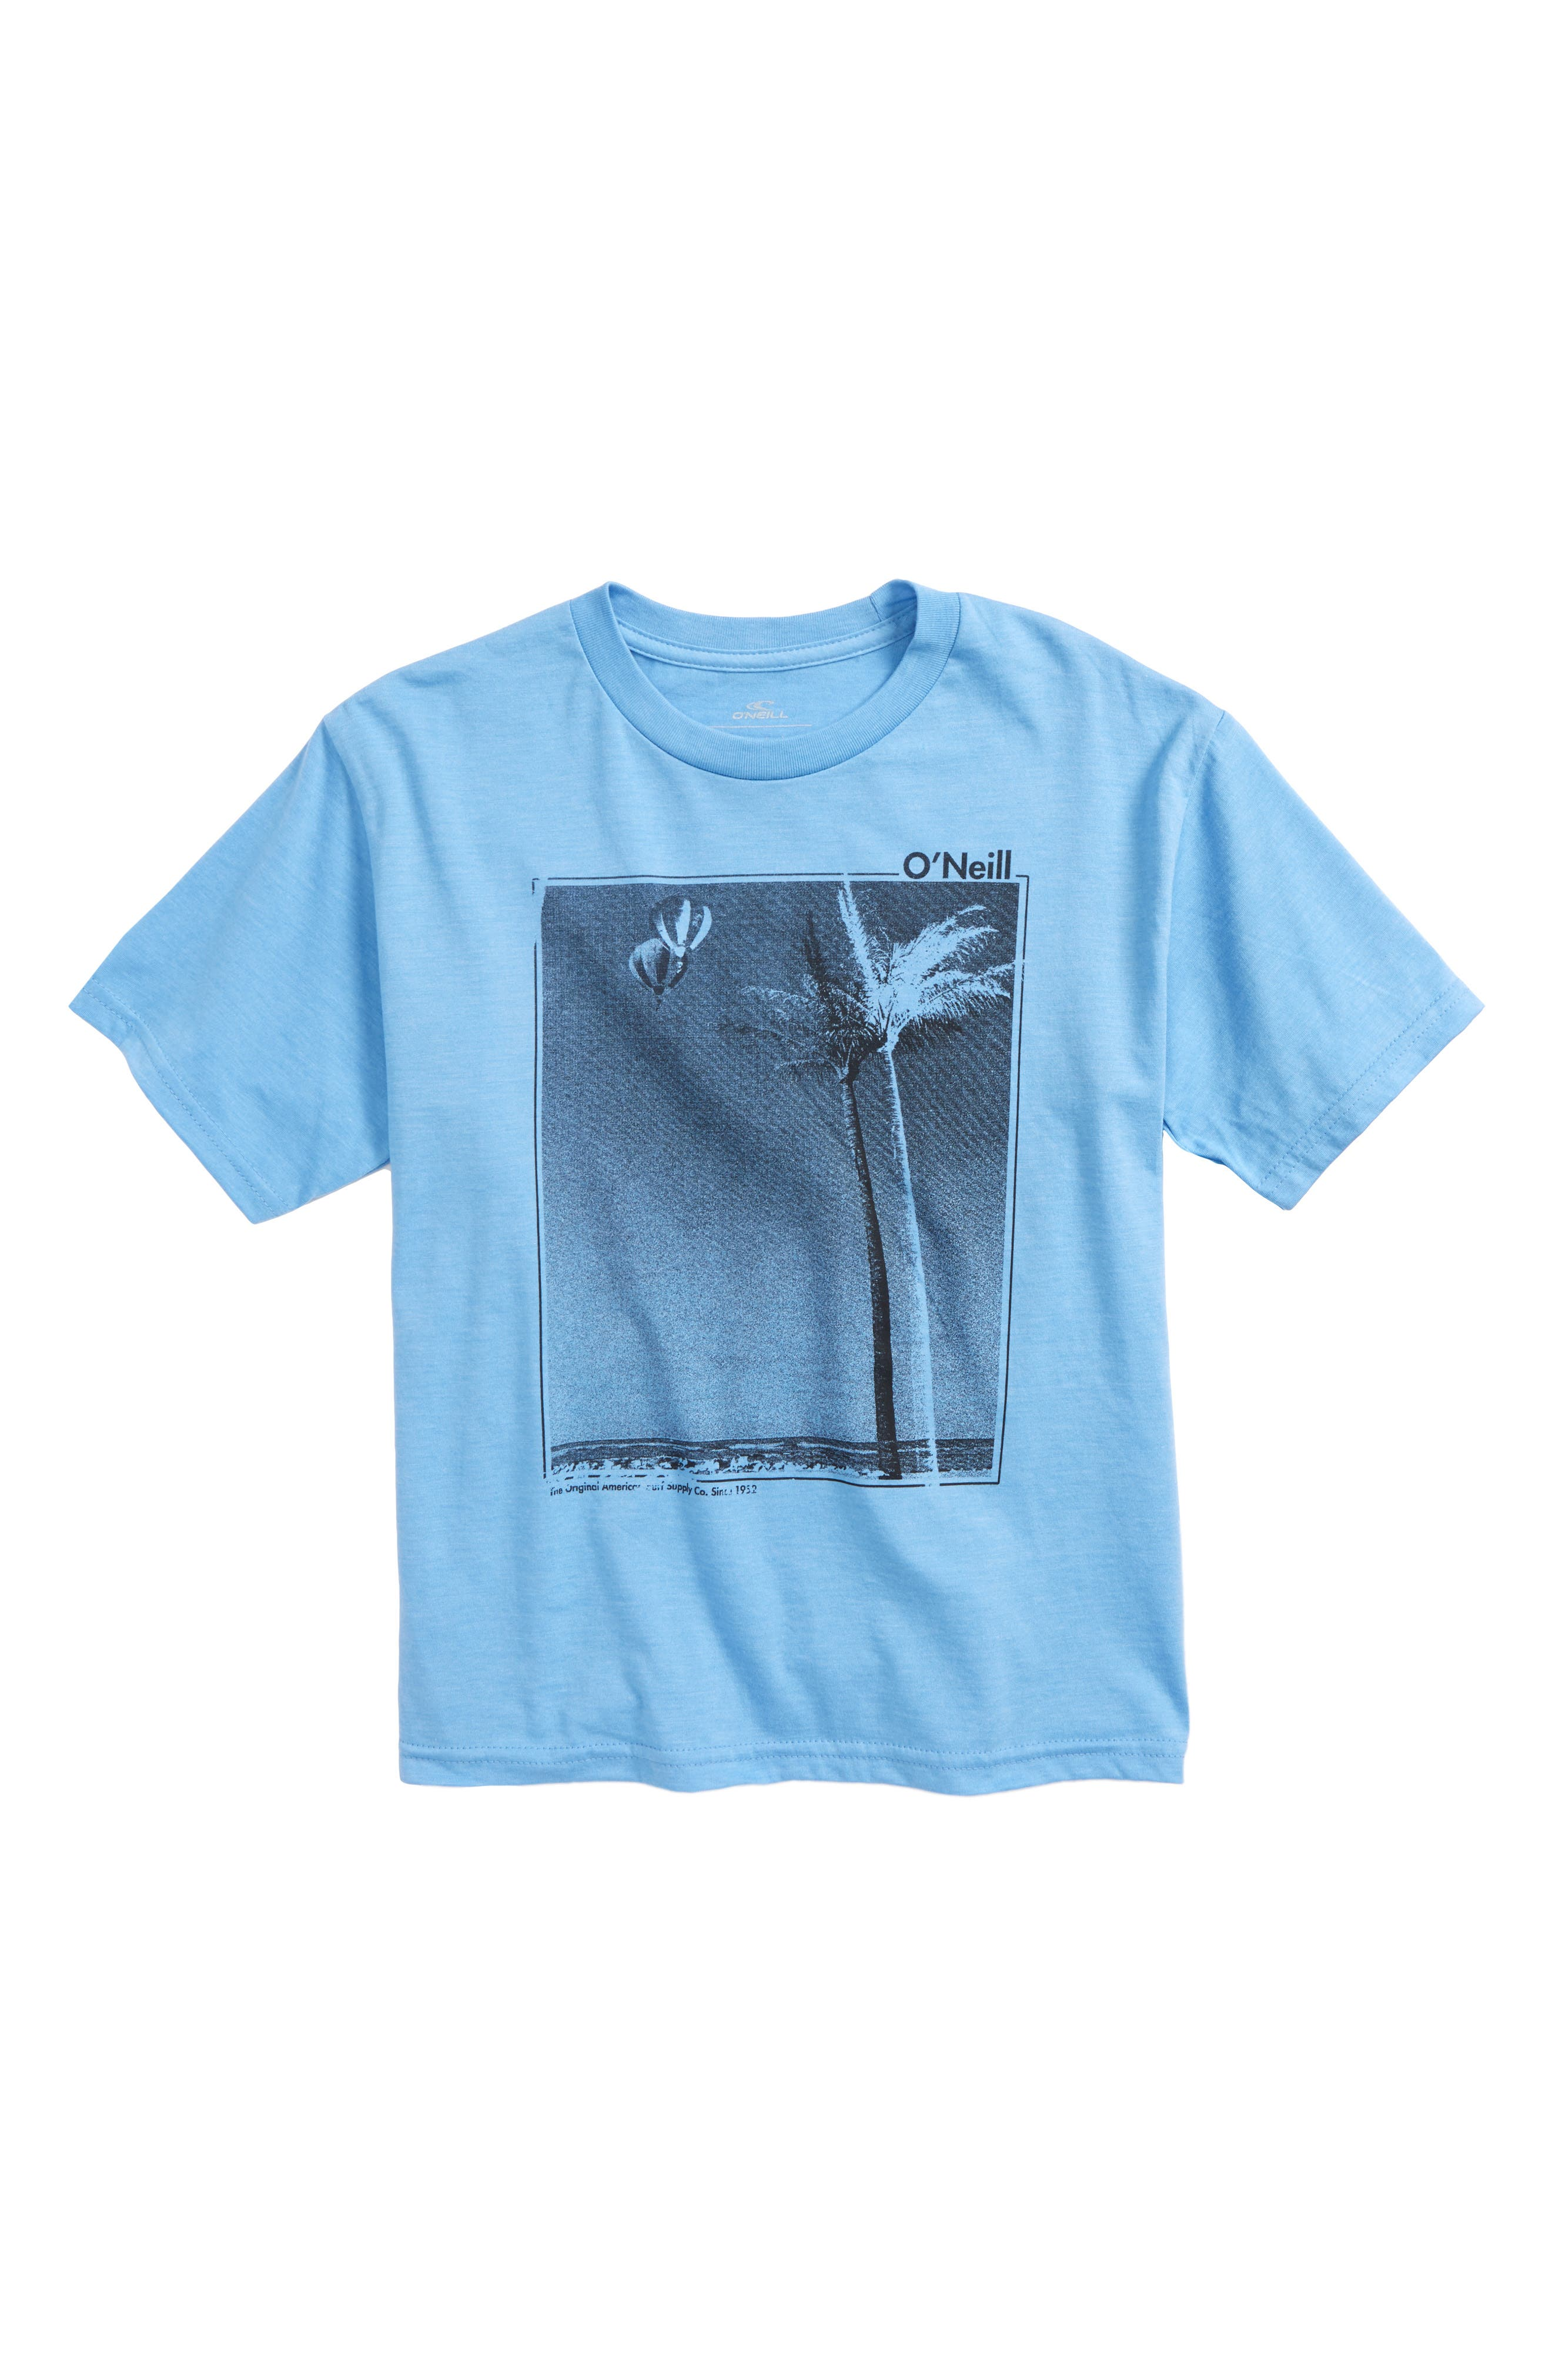 Treez T-Shirt,                         Main,                         color, Light Blue Heather